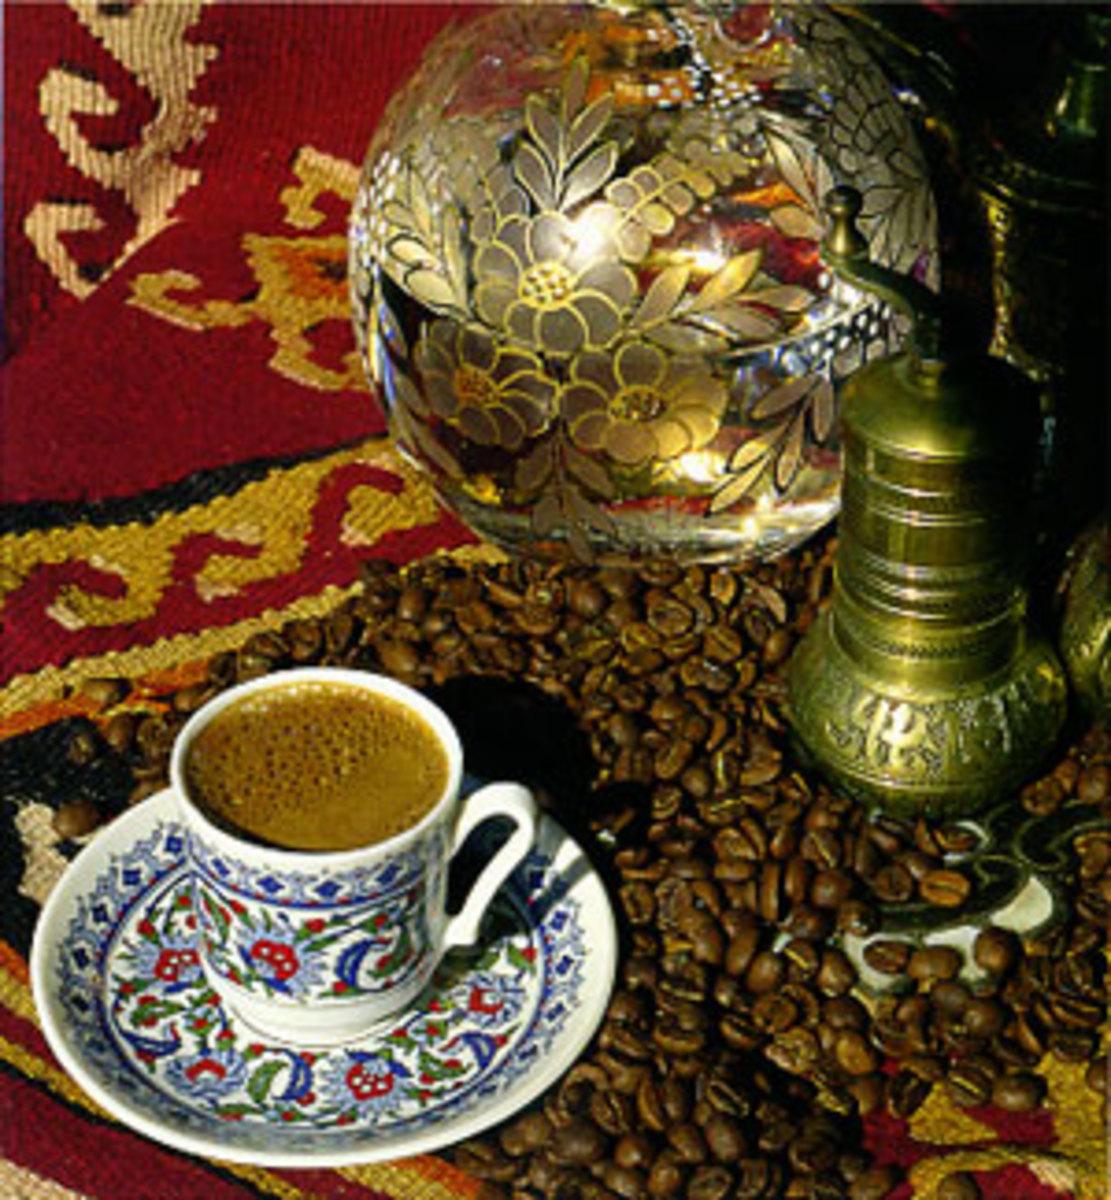 kona-coffee-the-drink-of-heaven